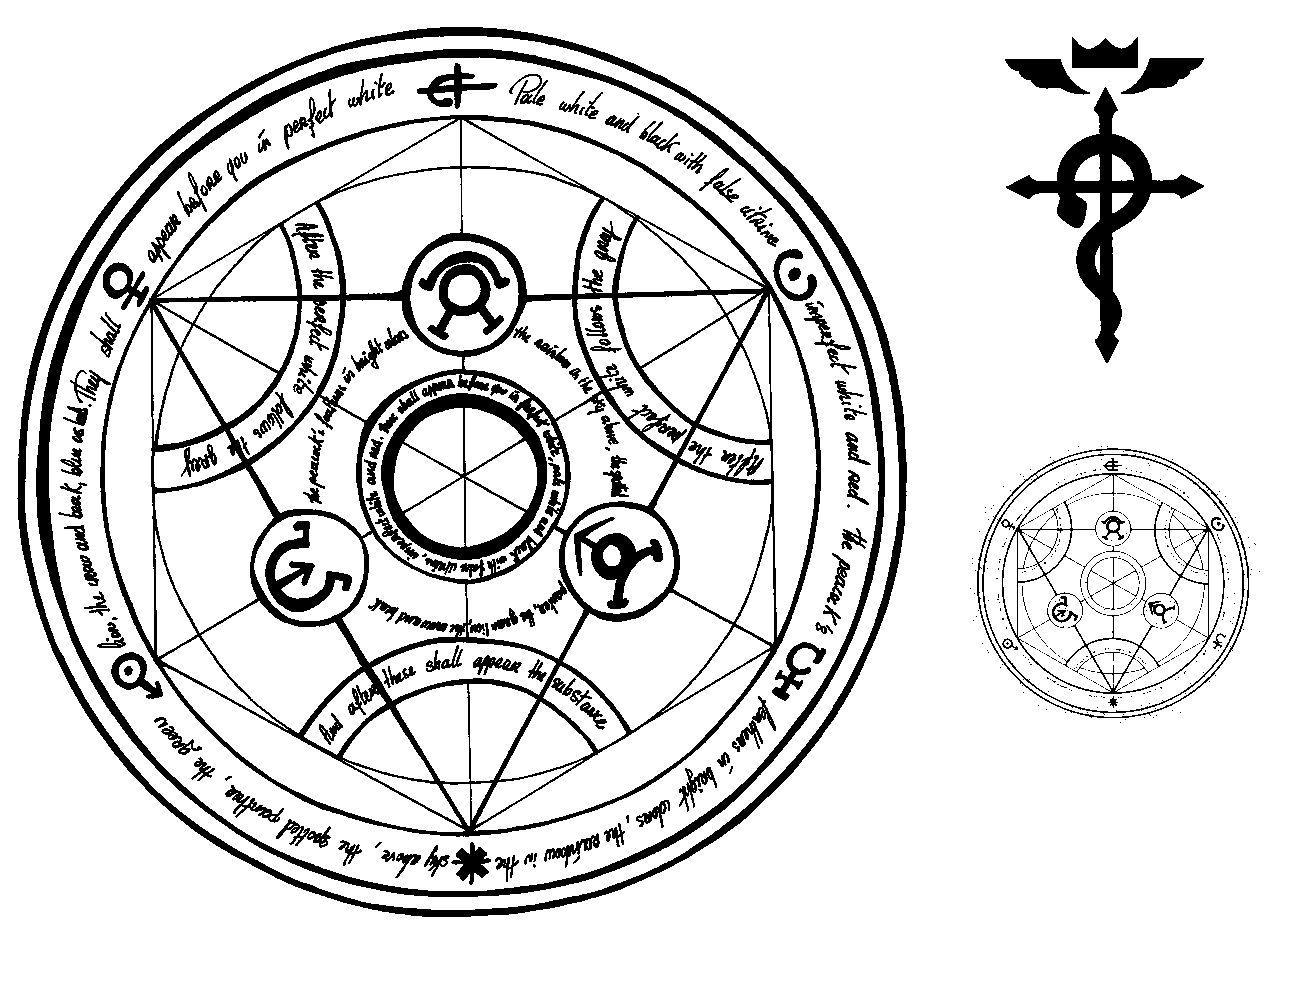 transmutation circle ideas pinterest alchemist fullmetal alchemist and alchemy. Black Bedroom Furniture Sets. Home Design Ideas